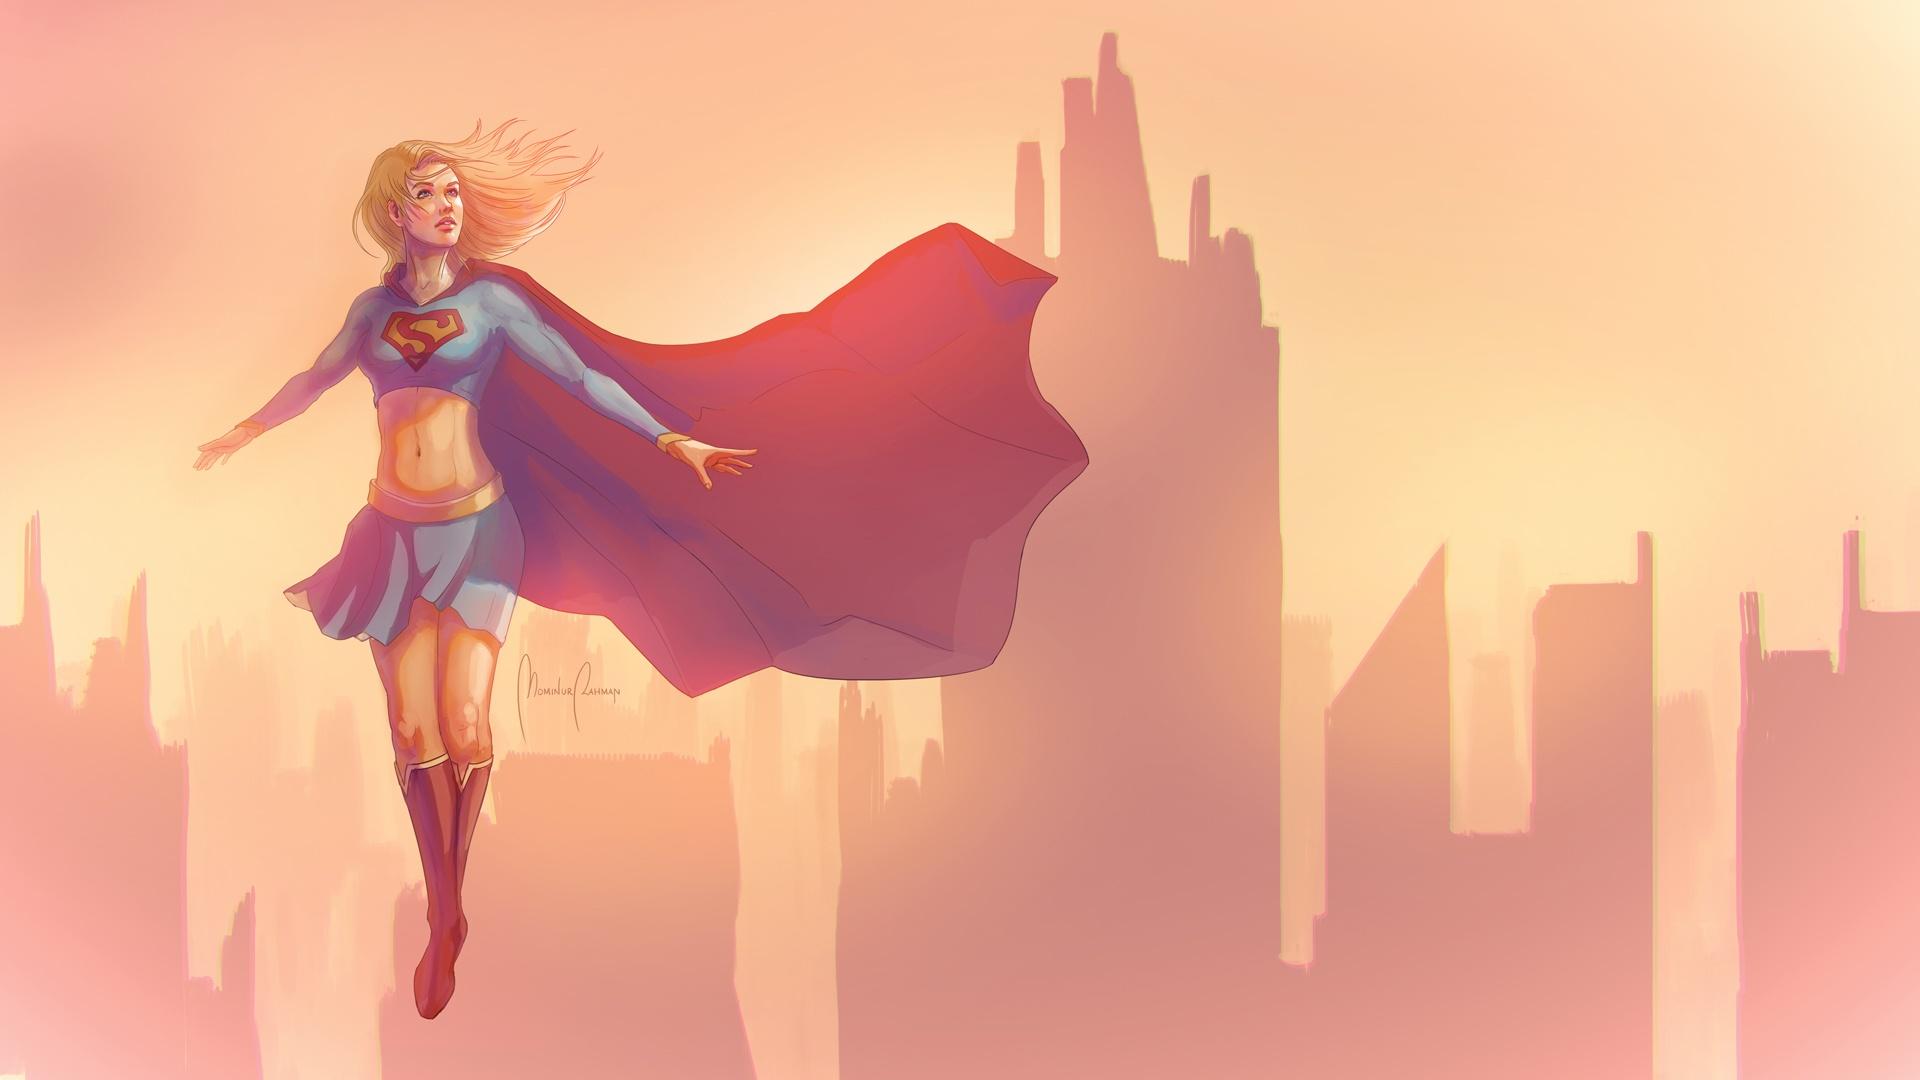 Supergirl free image